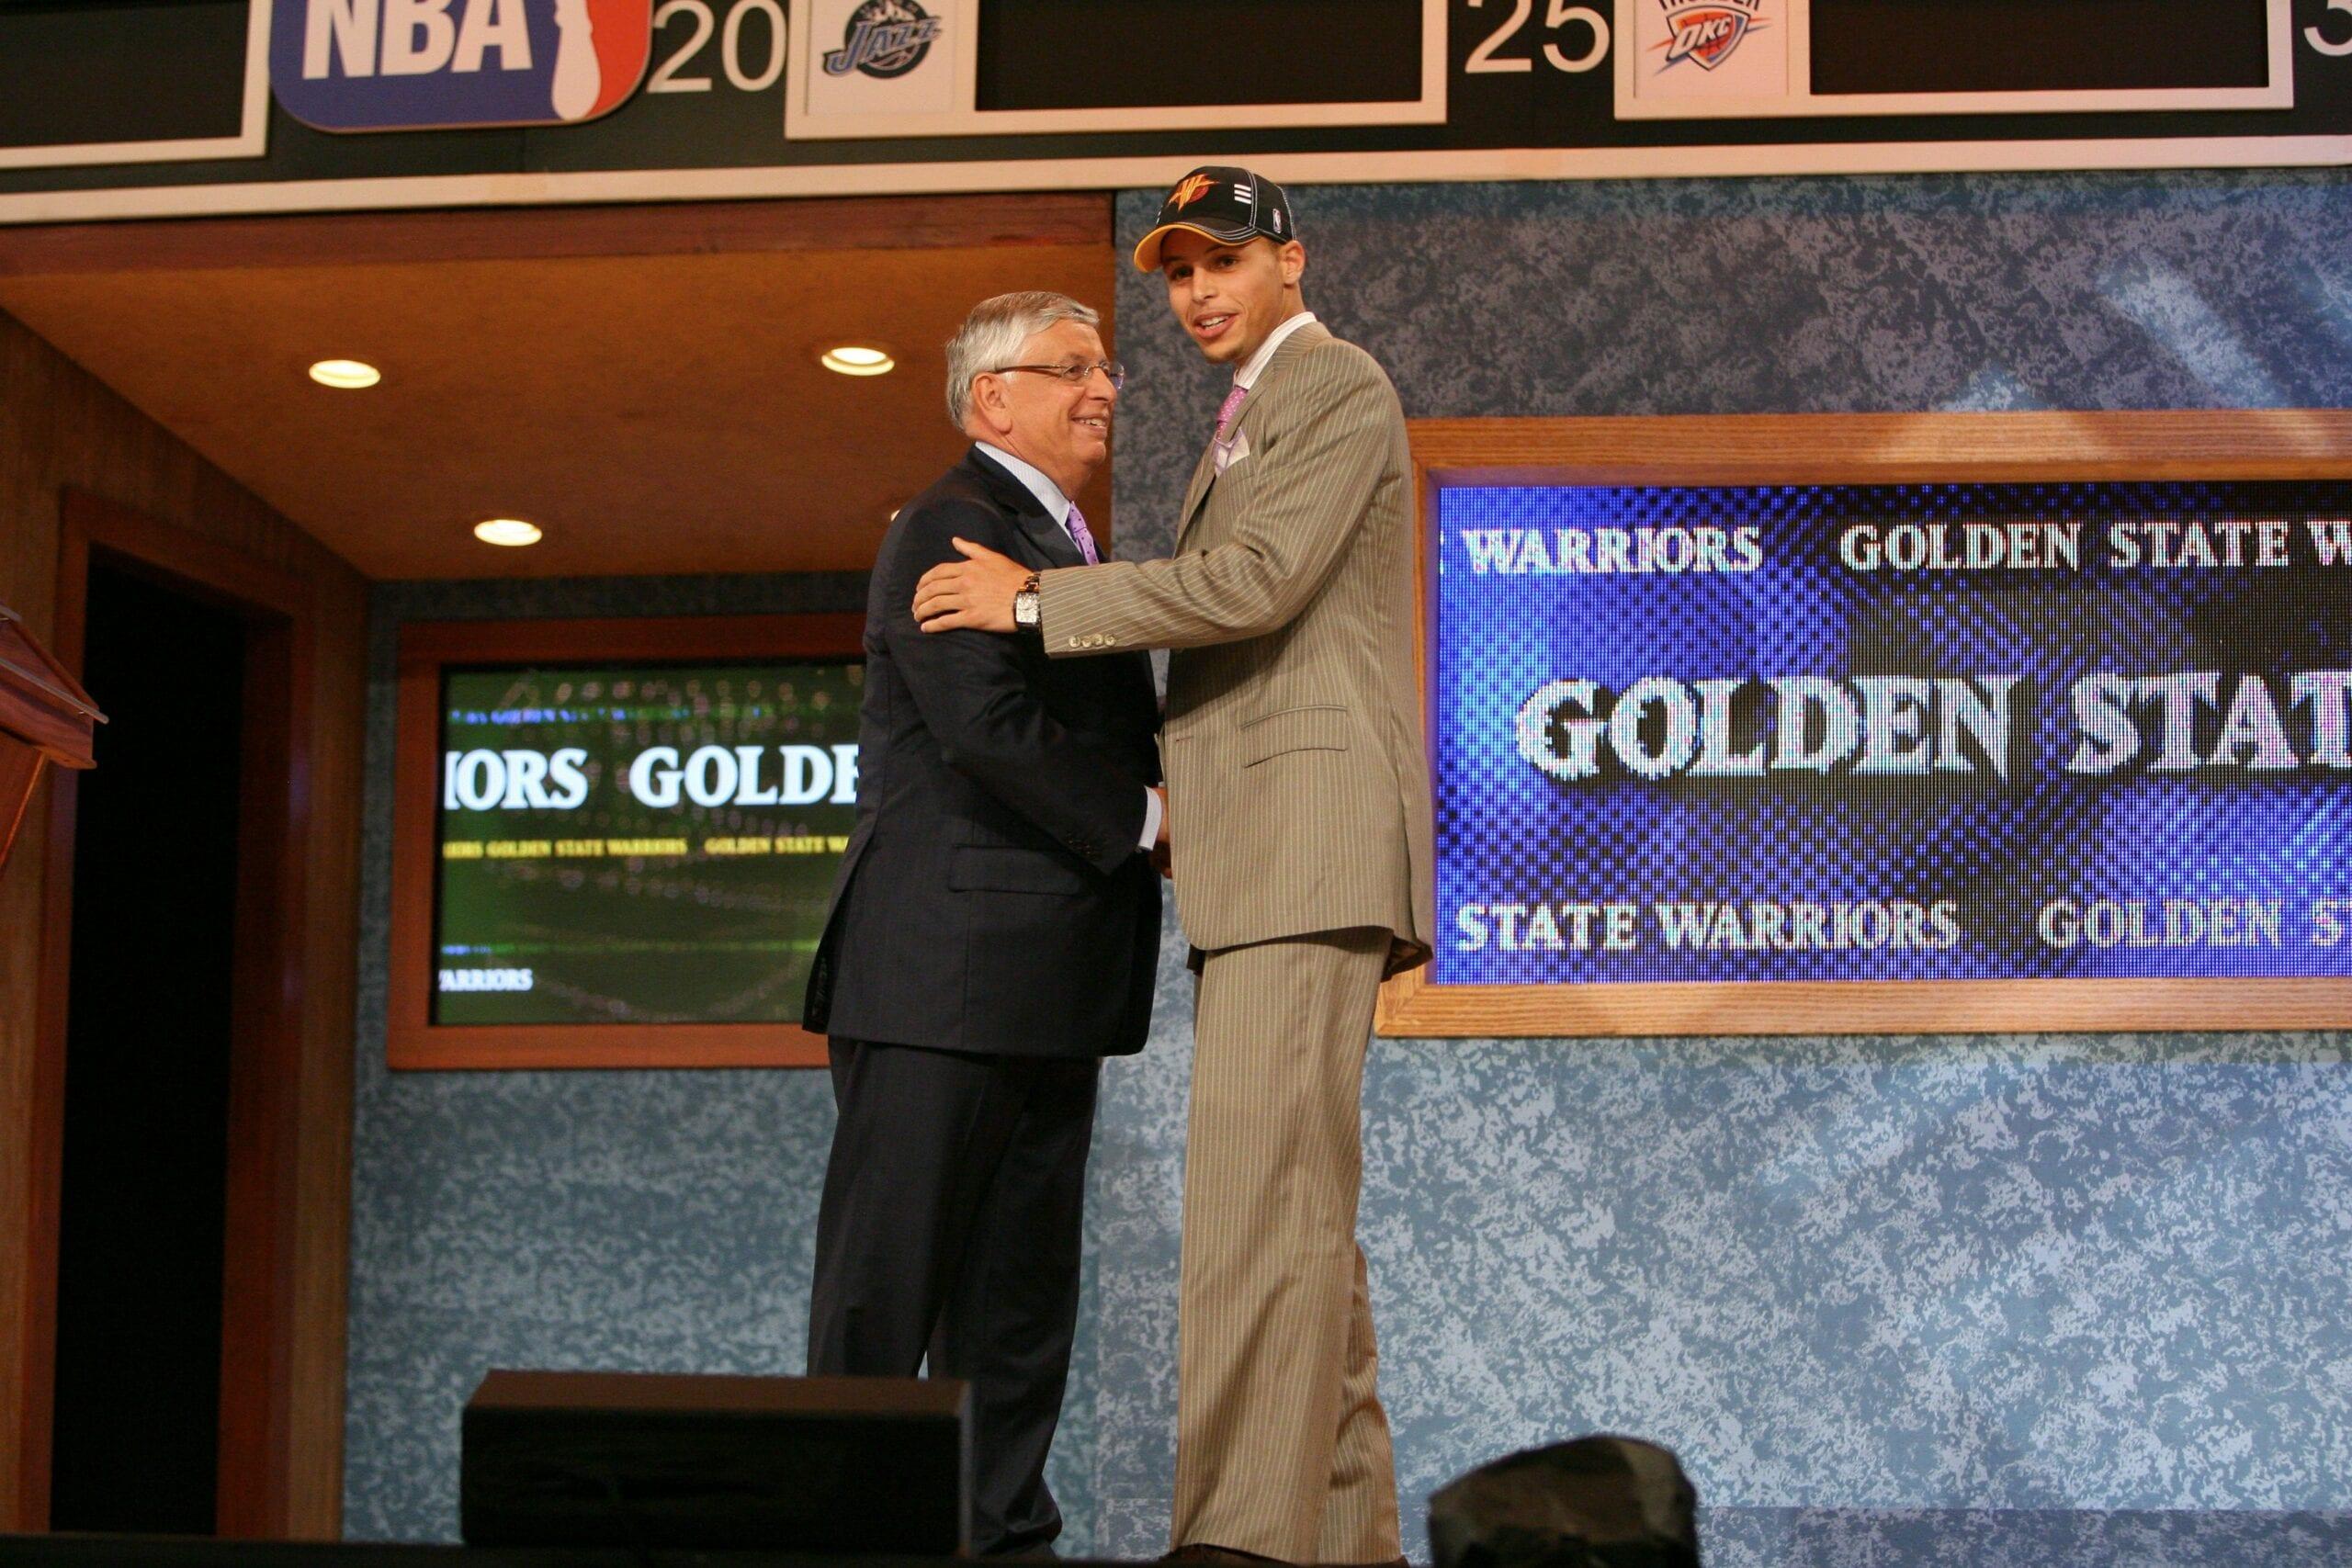 Every player chosen in NBA Draft history